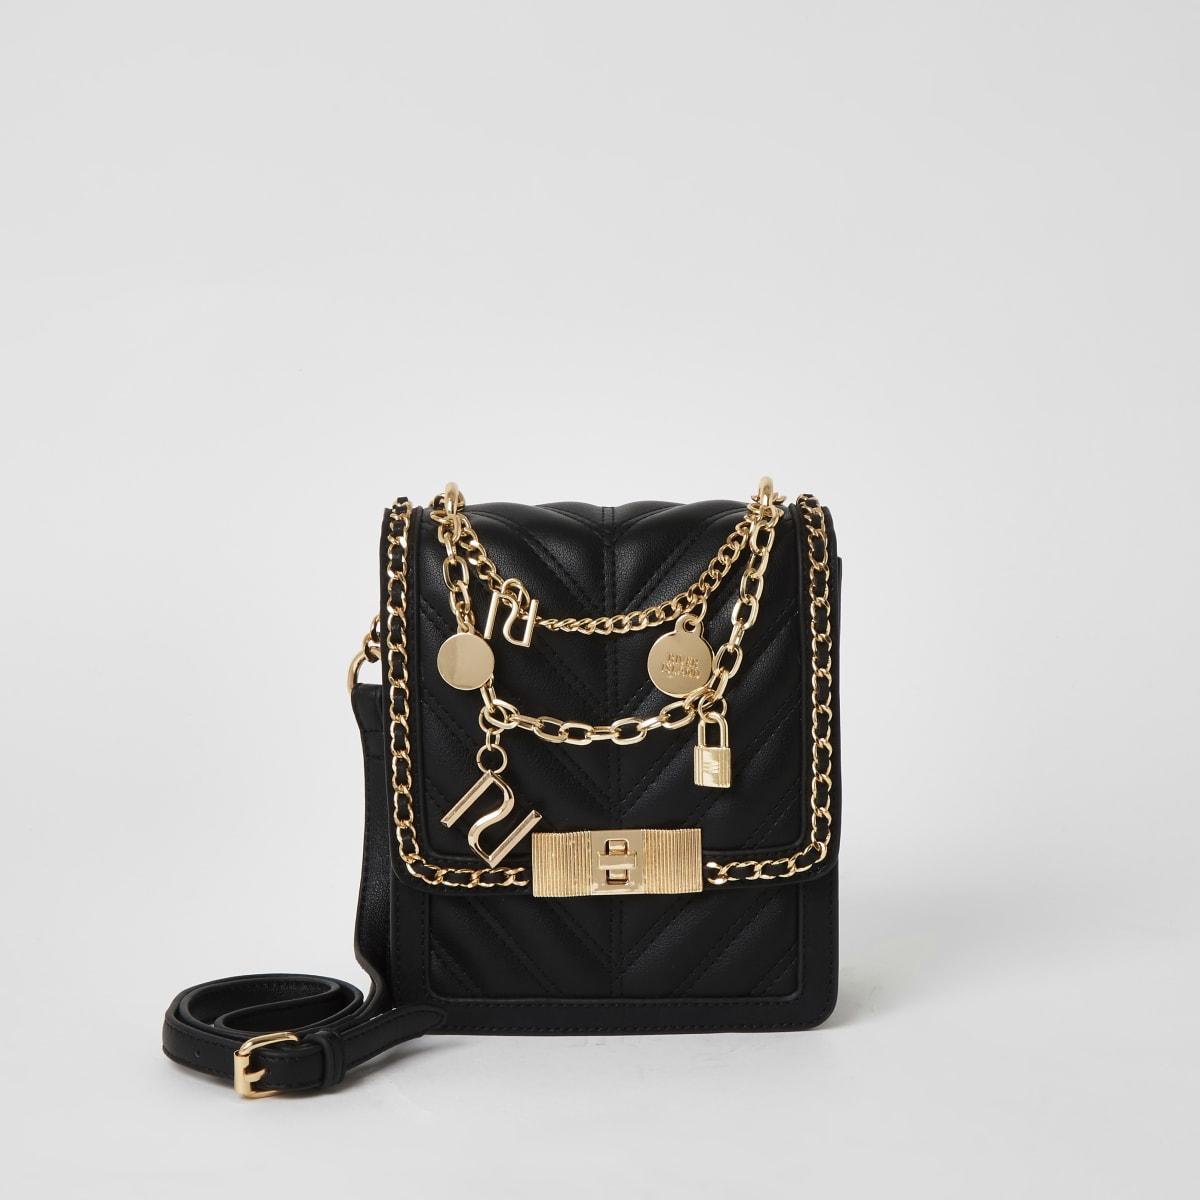 Zwarte vierkante crossbodytas met reliëf en ketting